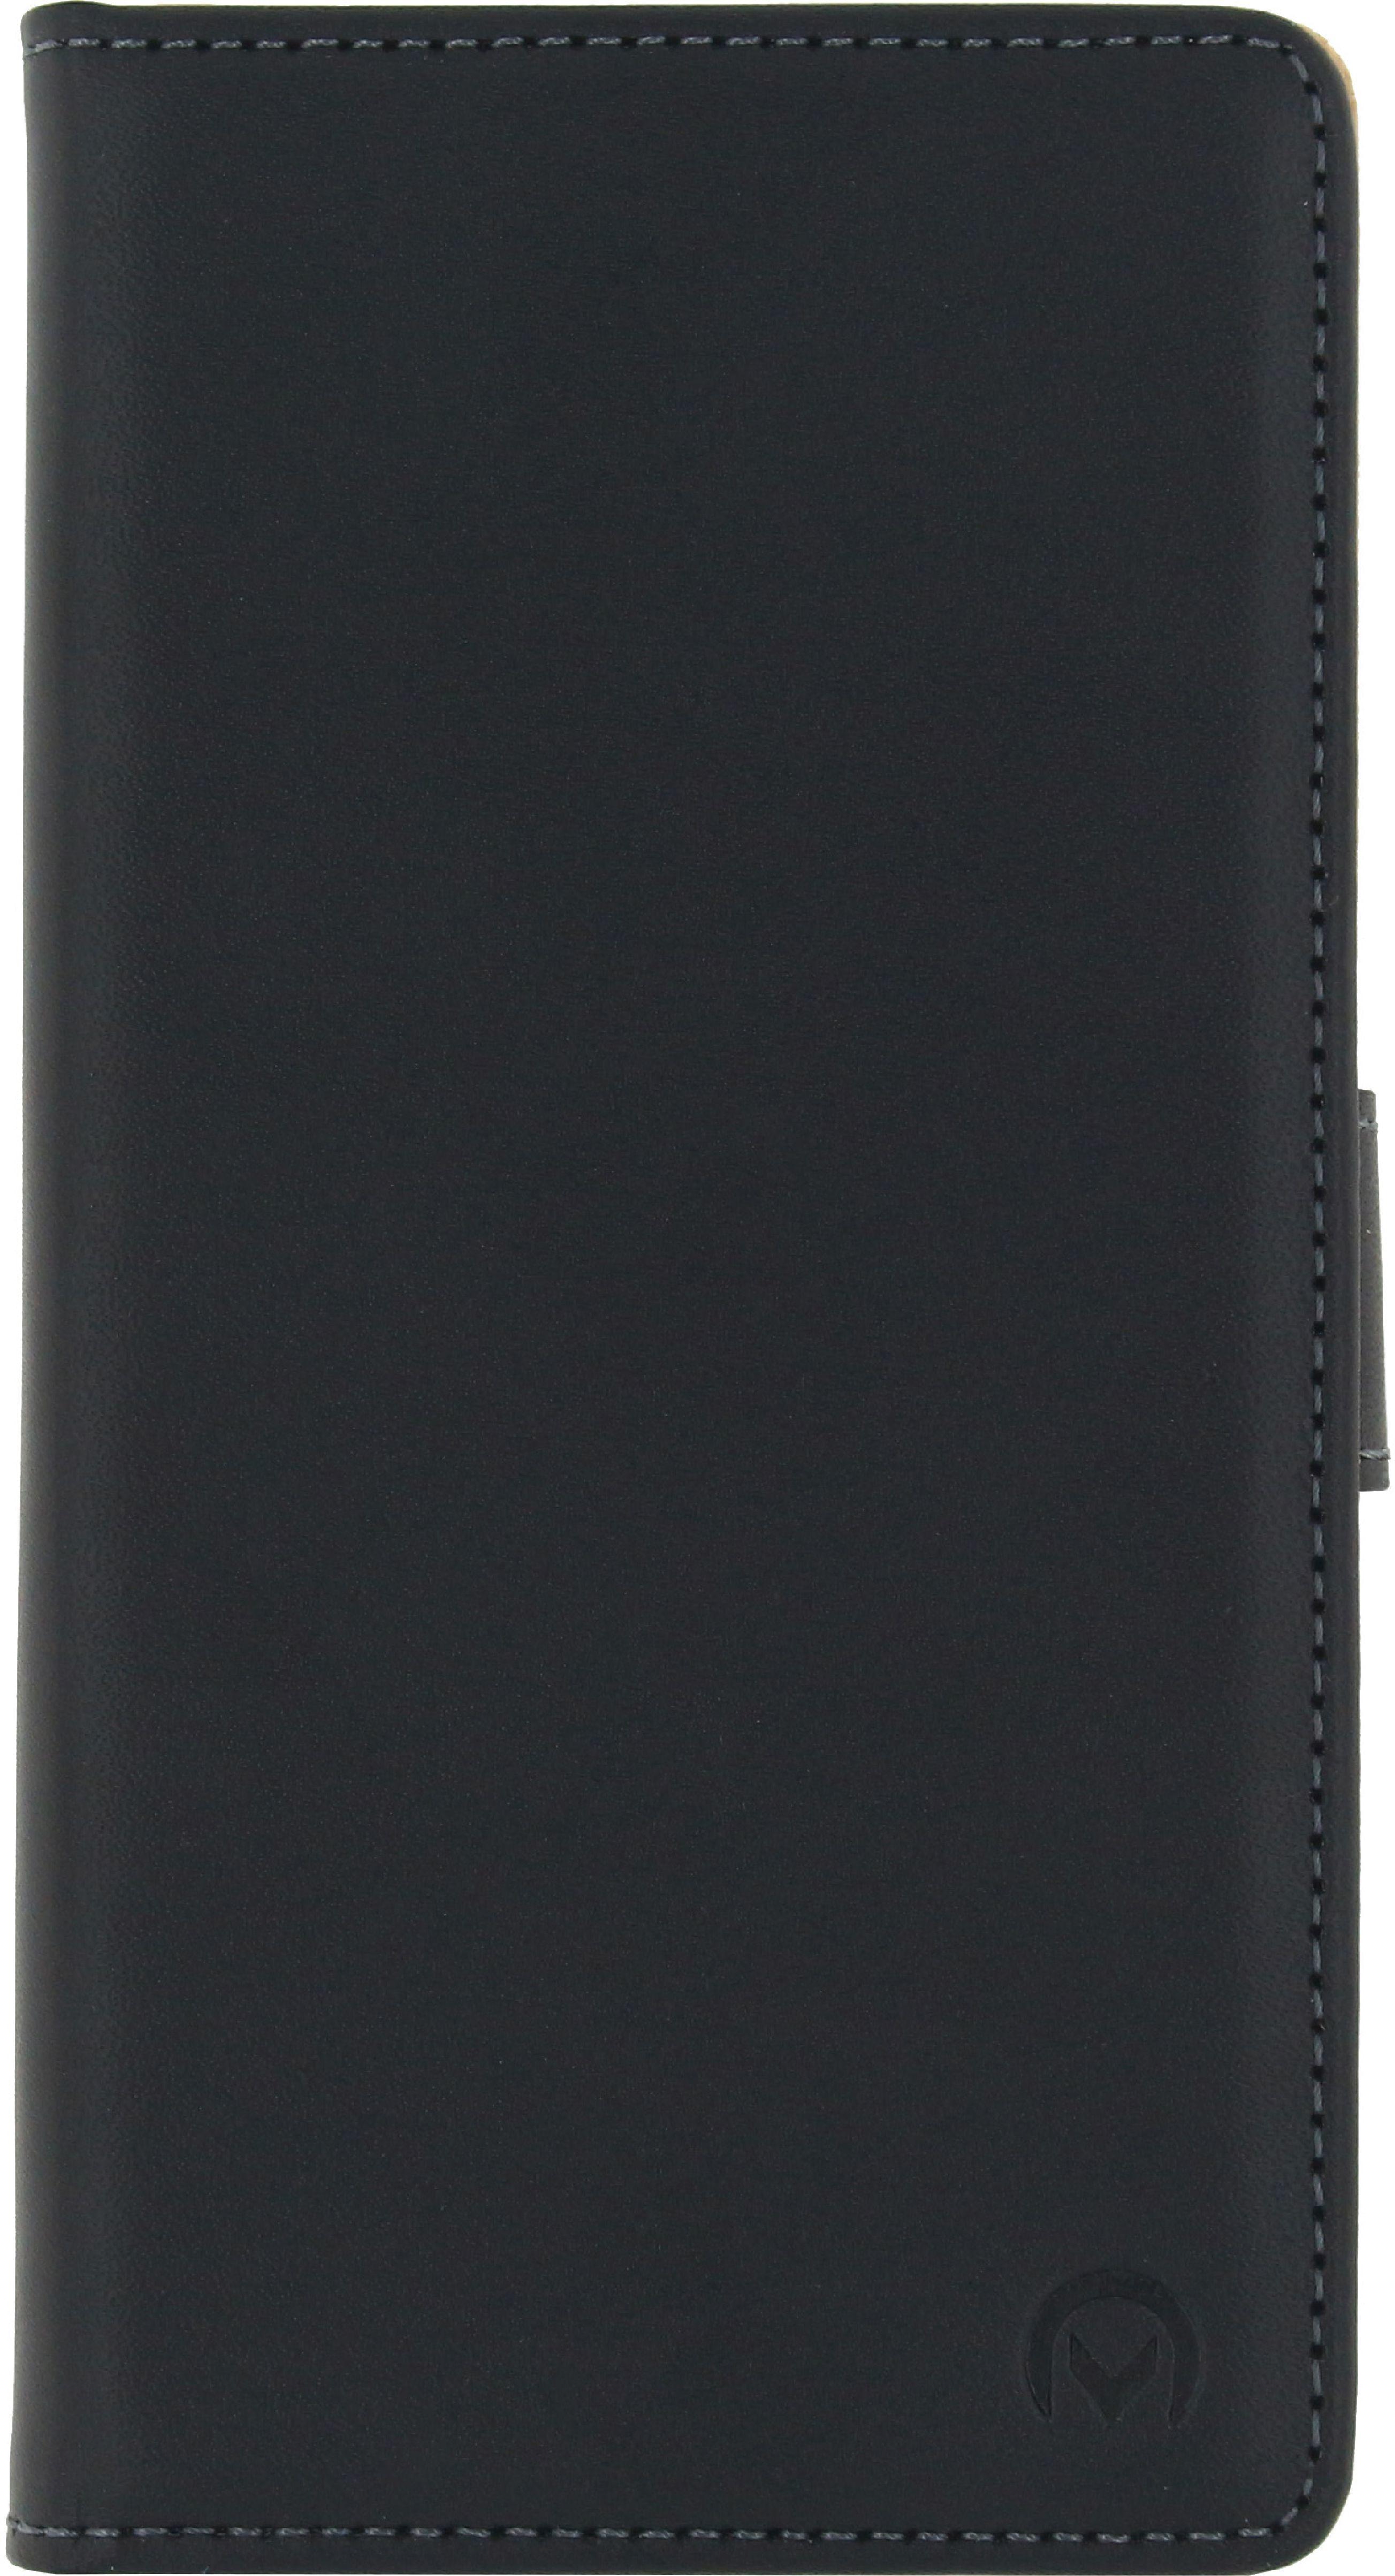 Image of   Telefon Tegnebogsetui Huawei Y6 2017 / Huawei Y5 2017 Sort